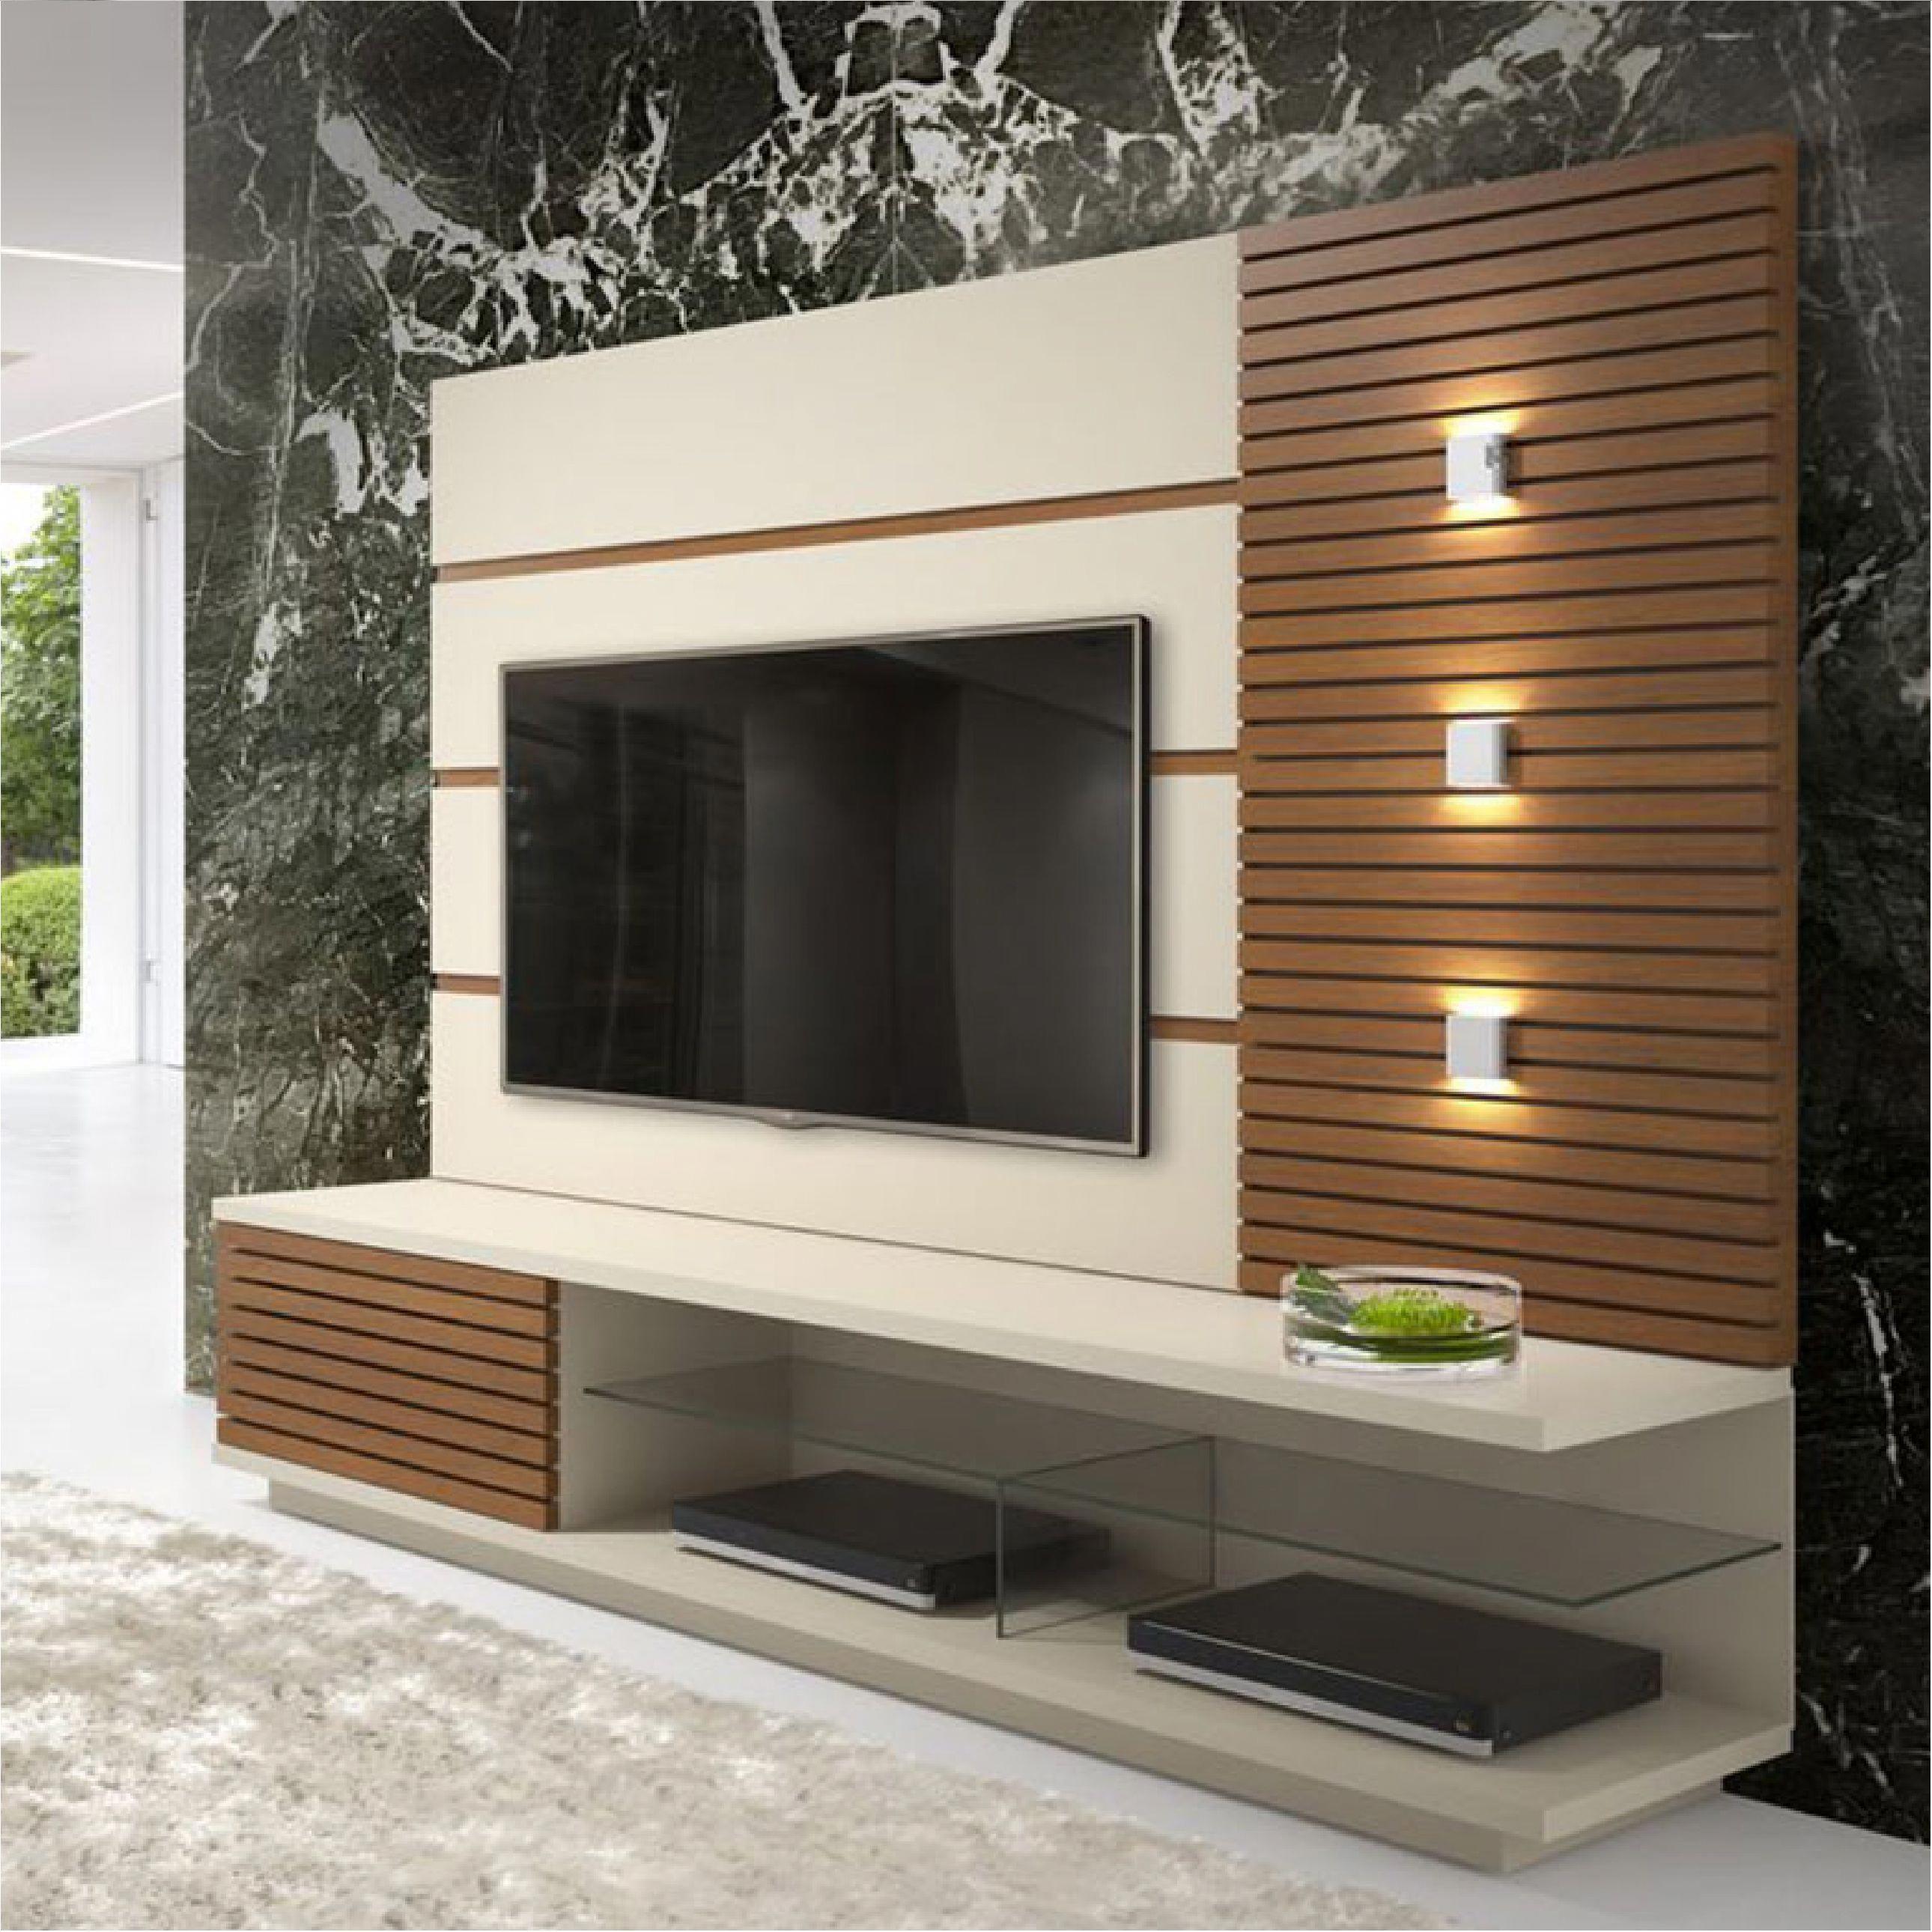 Lojas Rio Negrinho Ou Joinville Acesse Www Moradamoveis Com Whatsapp 047 9 9246 3012 Modern Tv Wall Units Living Room Tv Unit Designs Living Room Tv Unit